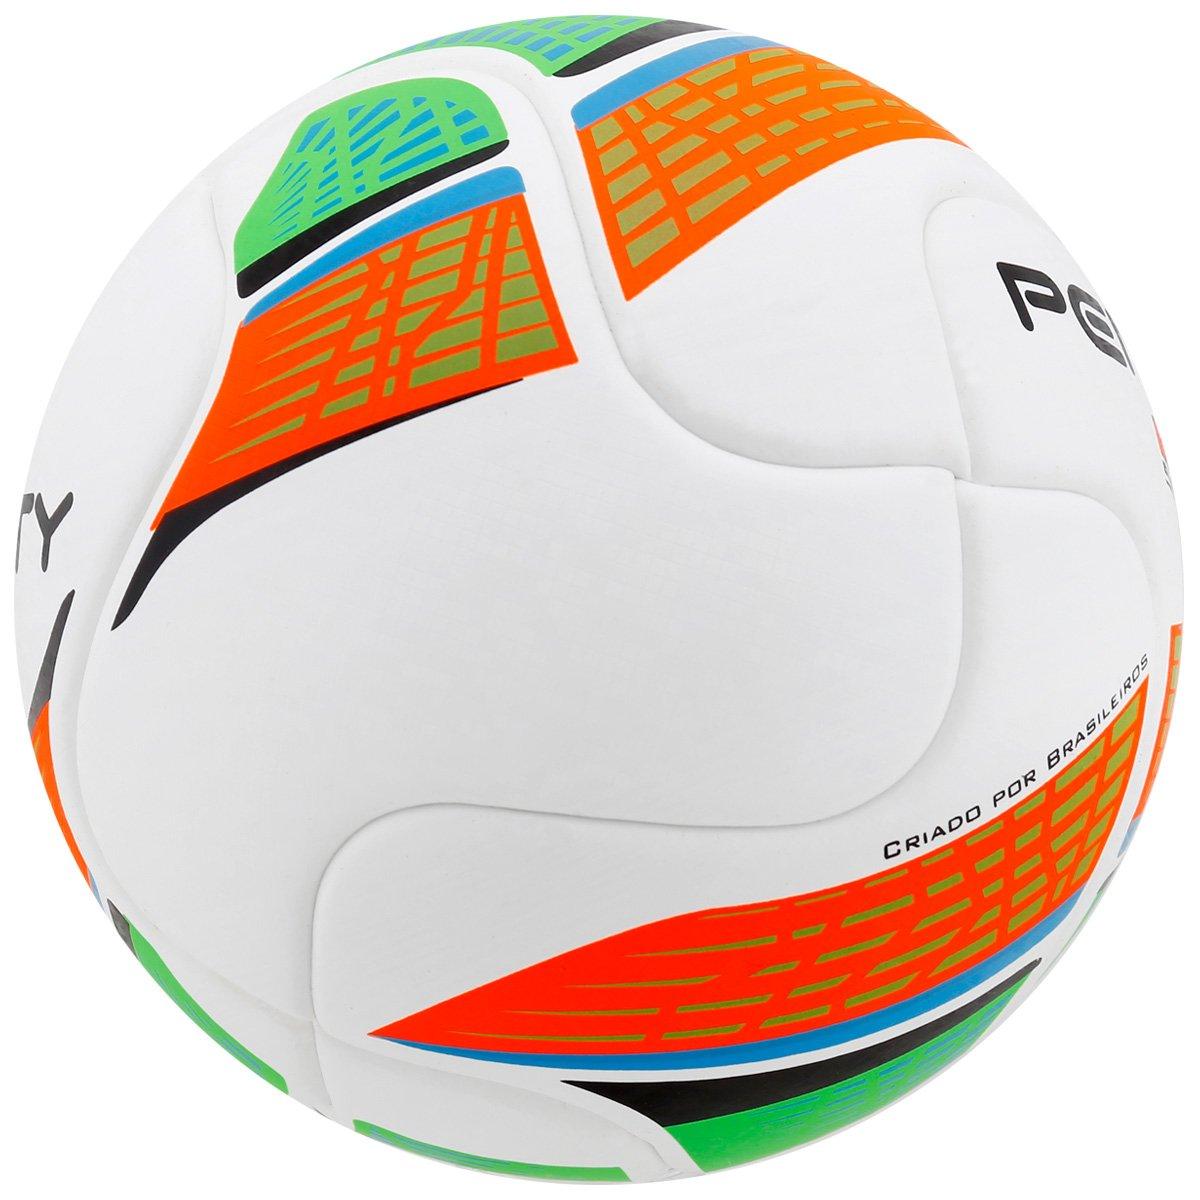 Bola Futebol Penalty Max 50 Termotec 5 Futsal - Compre Agora  b9903dcaa5b41